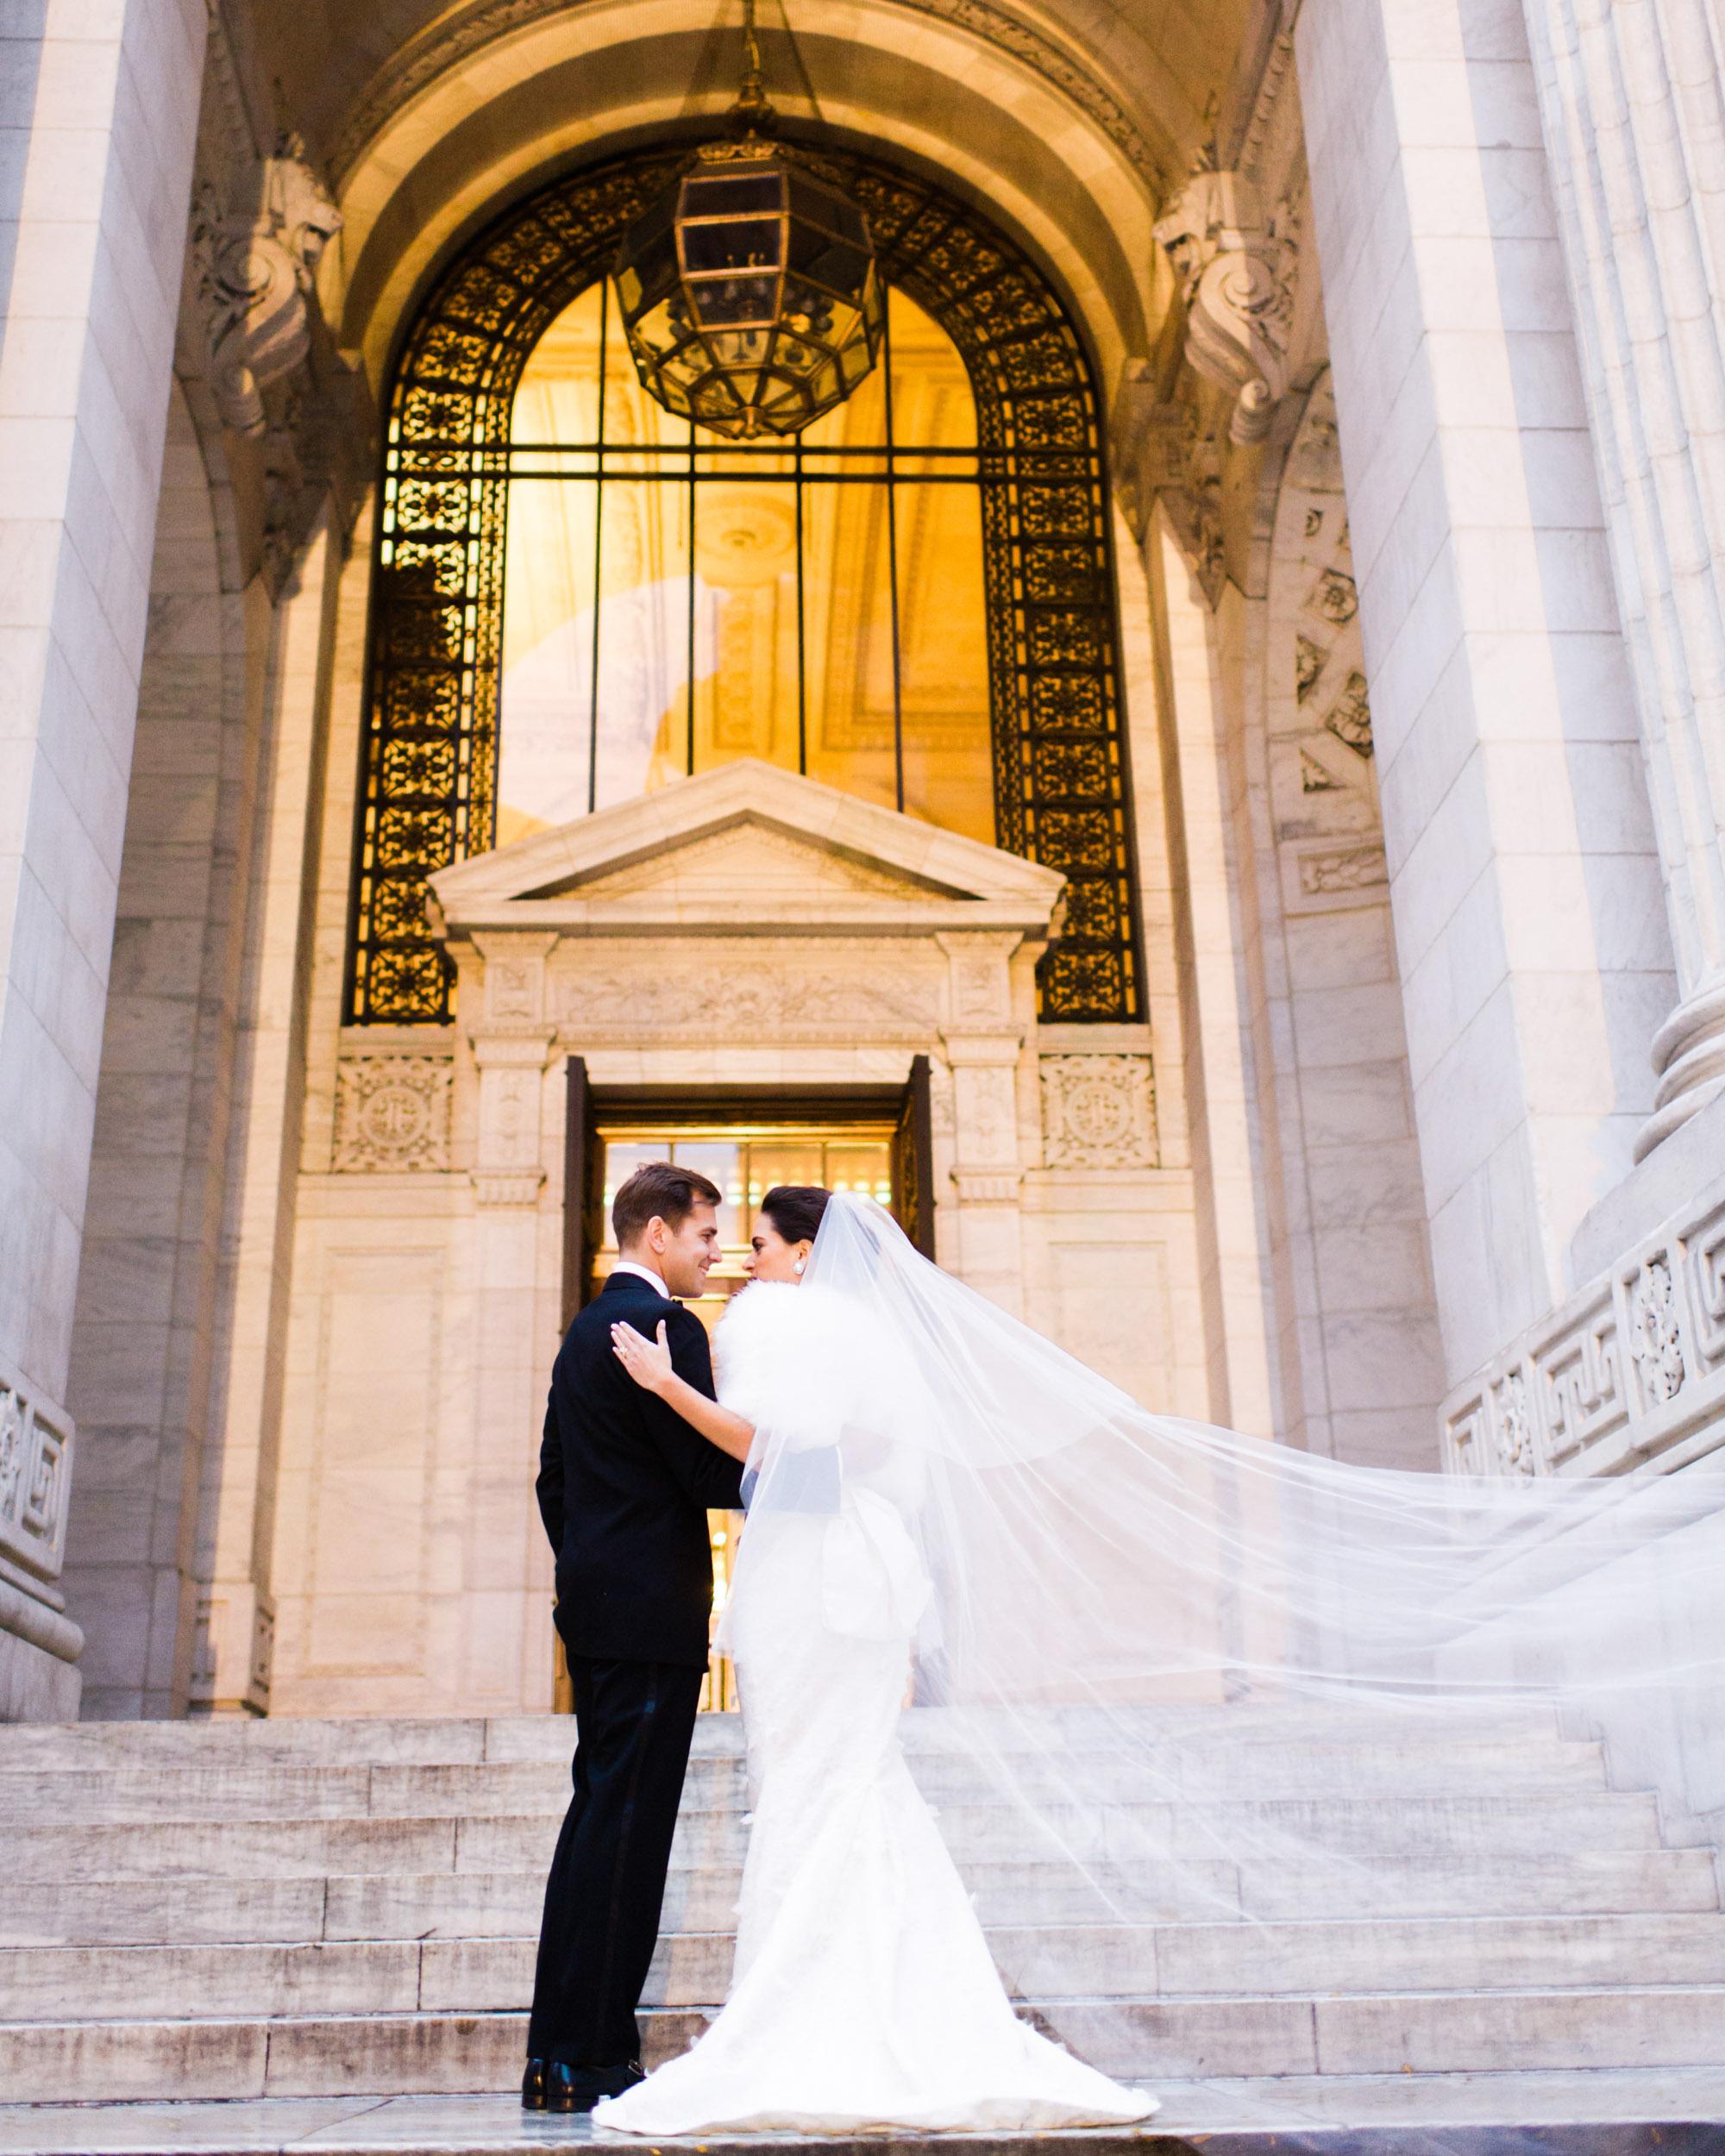 New York Public Library Wedding Photographer 66 - New York Public Library